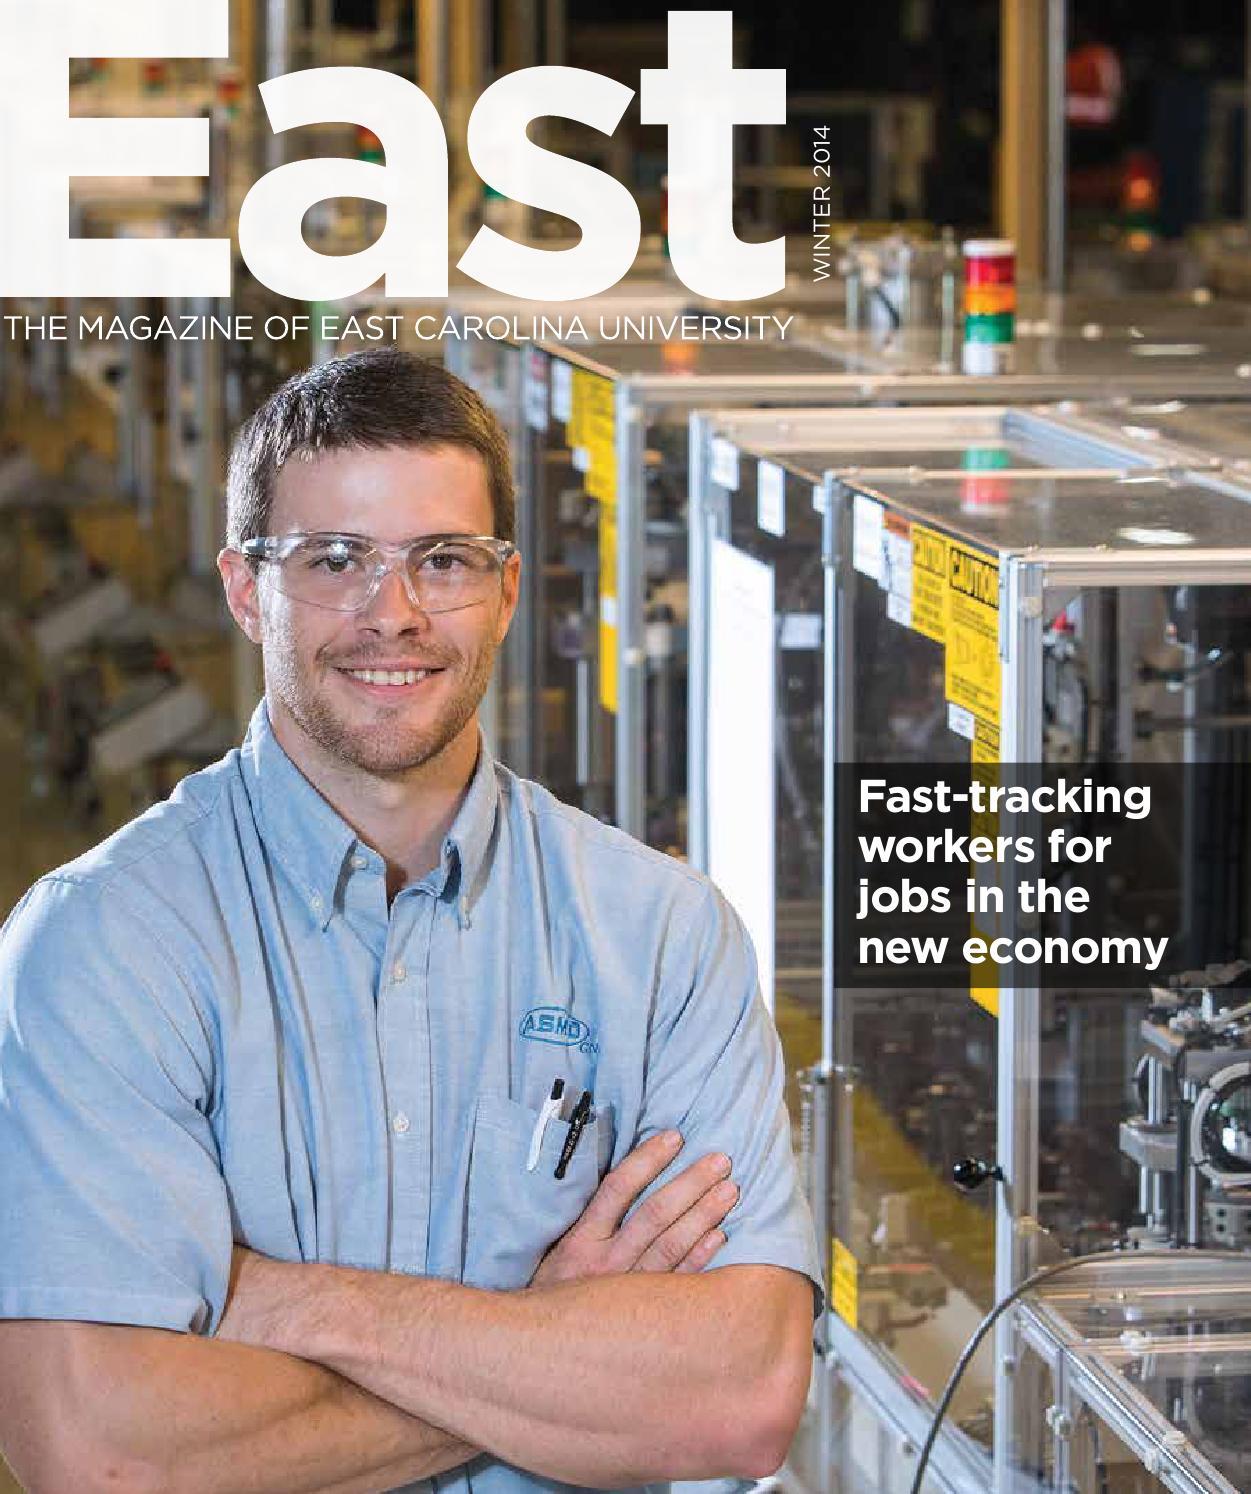 east spring 2012 by east carolina university issuu east winter 2014